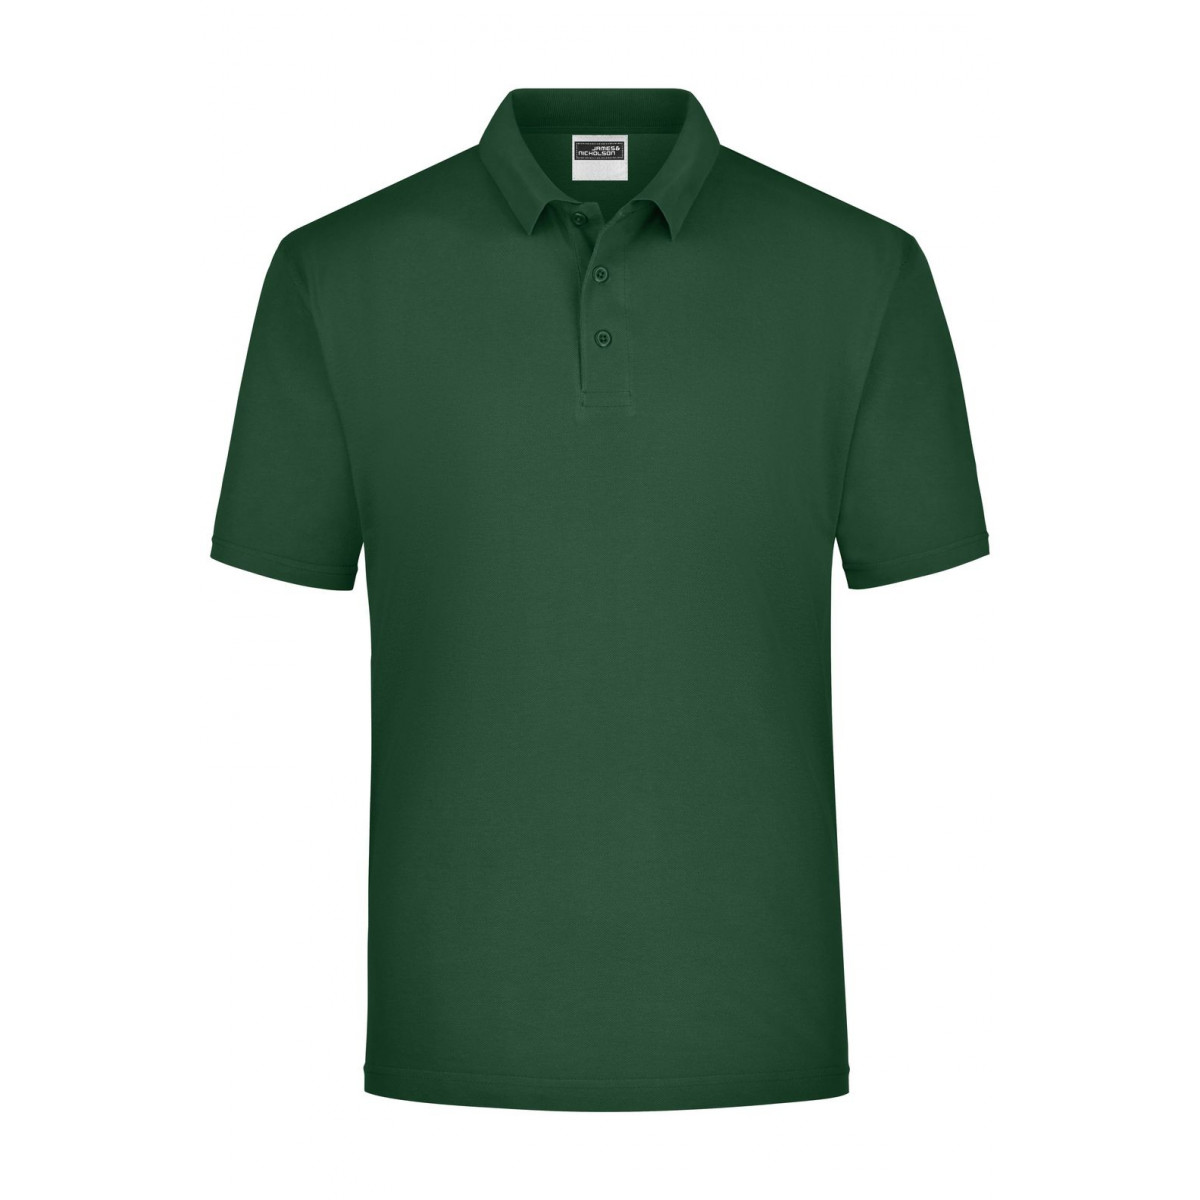 Рубашка поло мужская JN021 Polo Piqué Heavy - Темно-зеленый